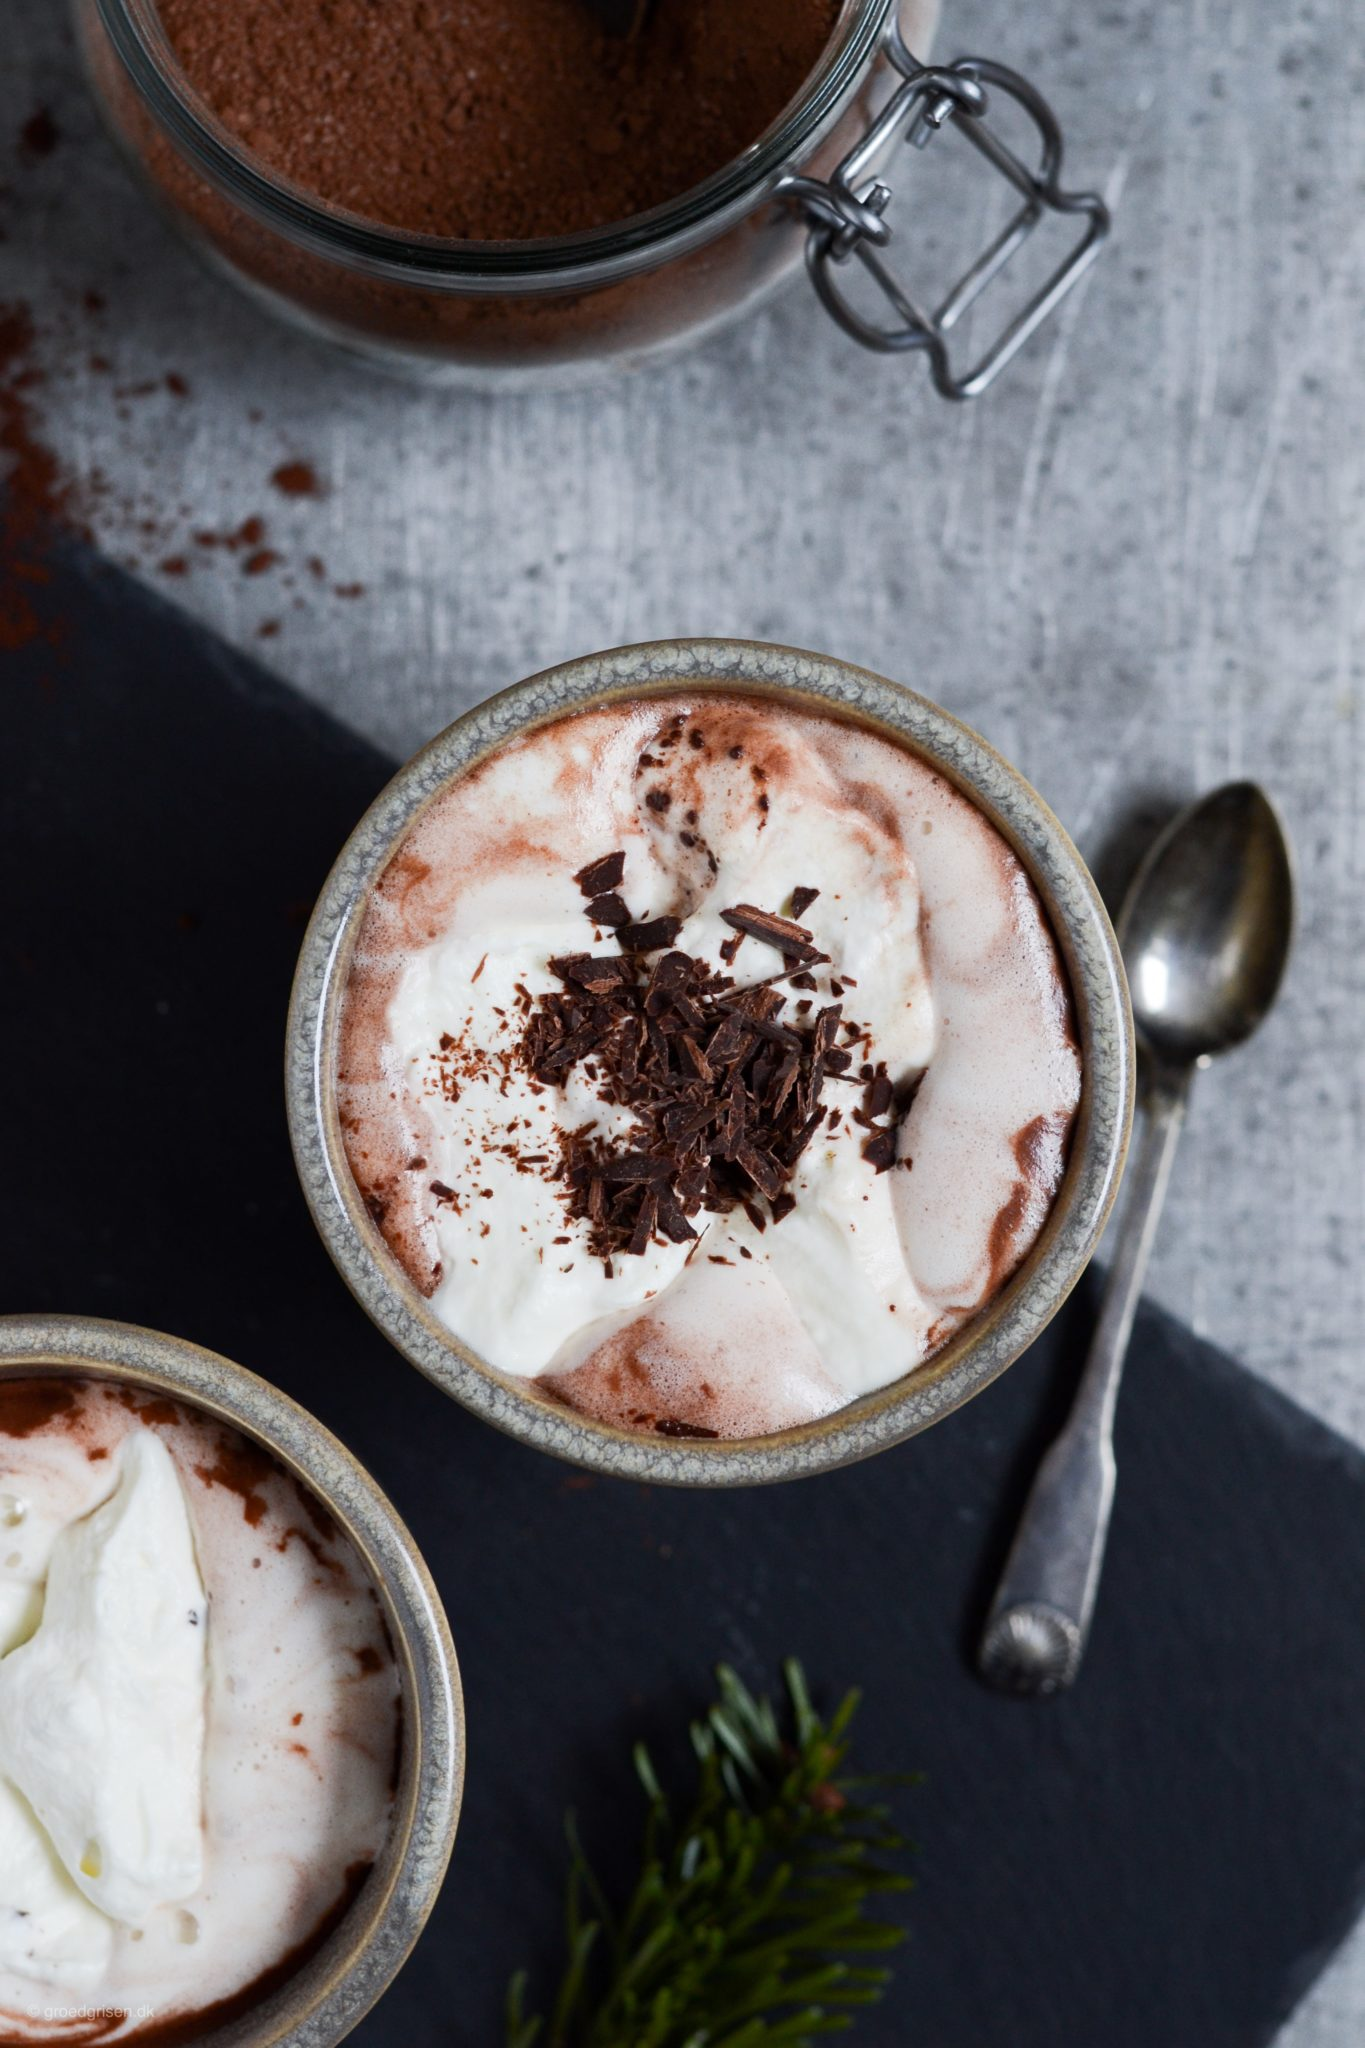 Kakaopulver til varm kakao 1